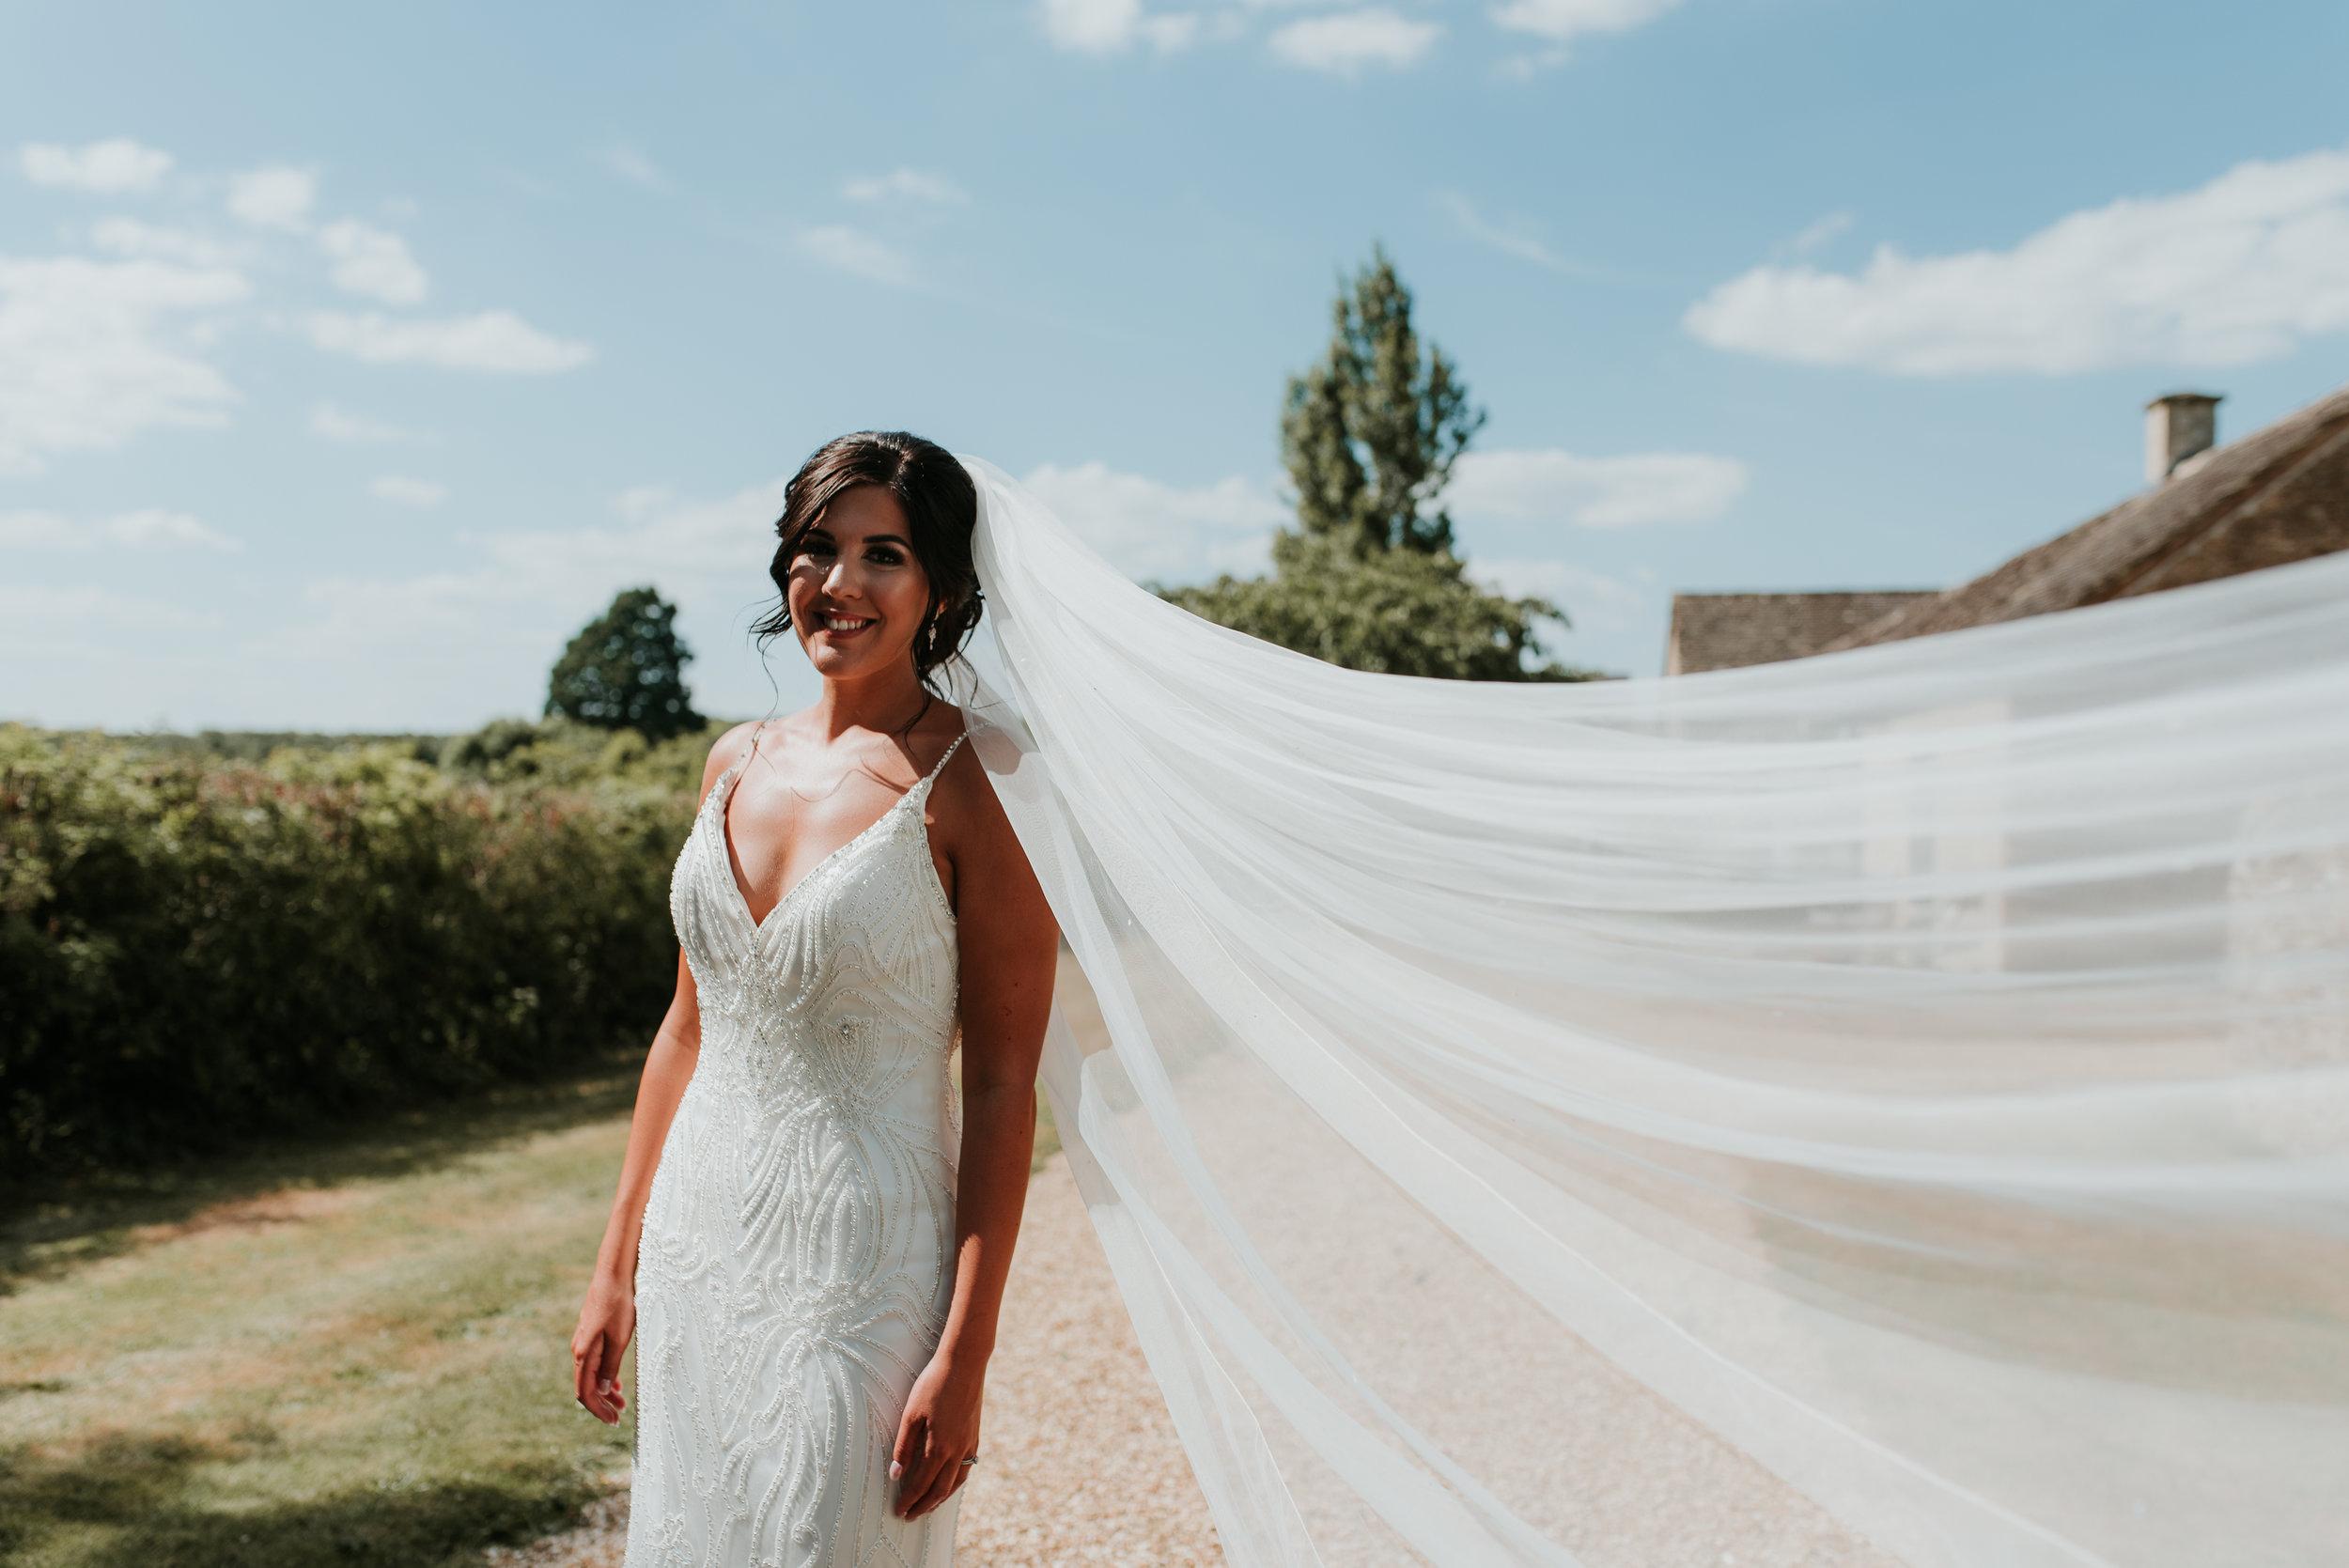 Oxfordshire-wedding-photographer-50.jpg